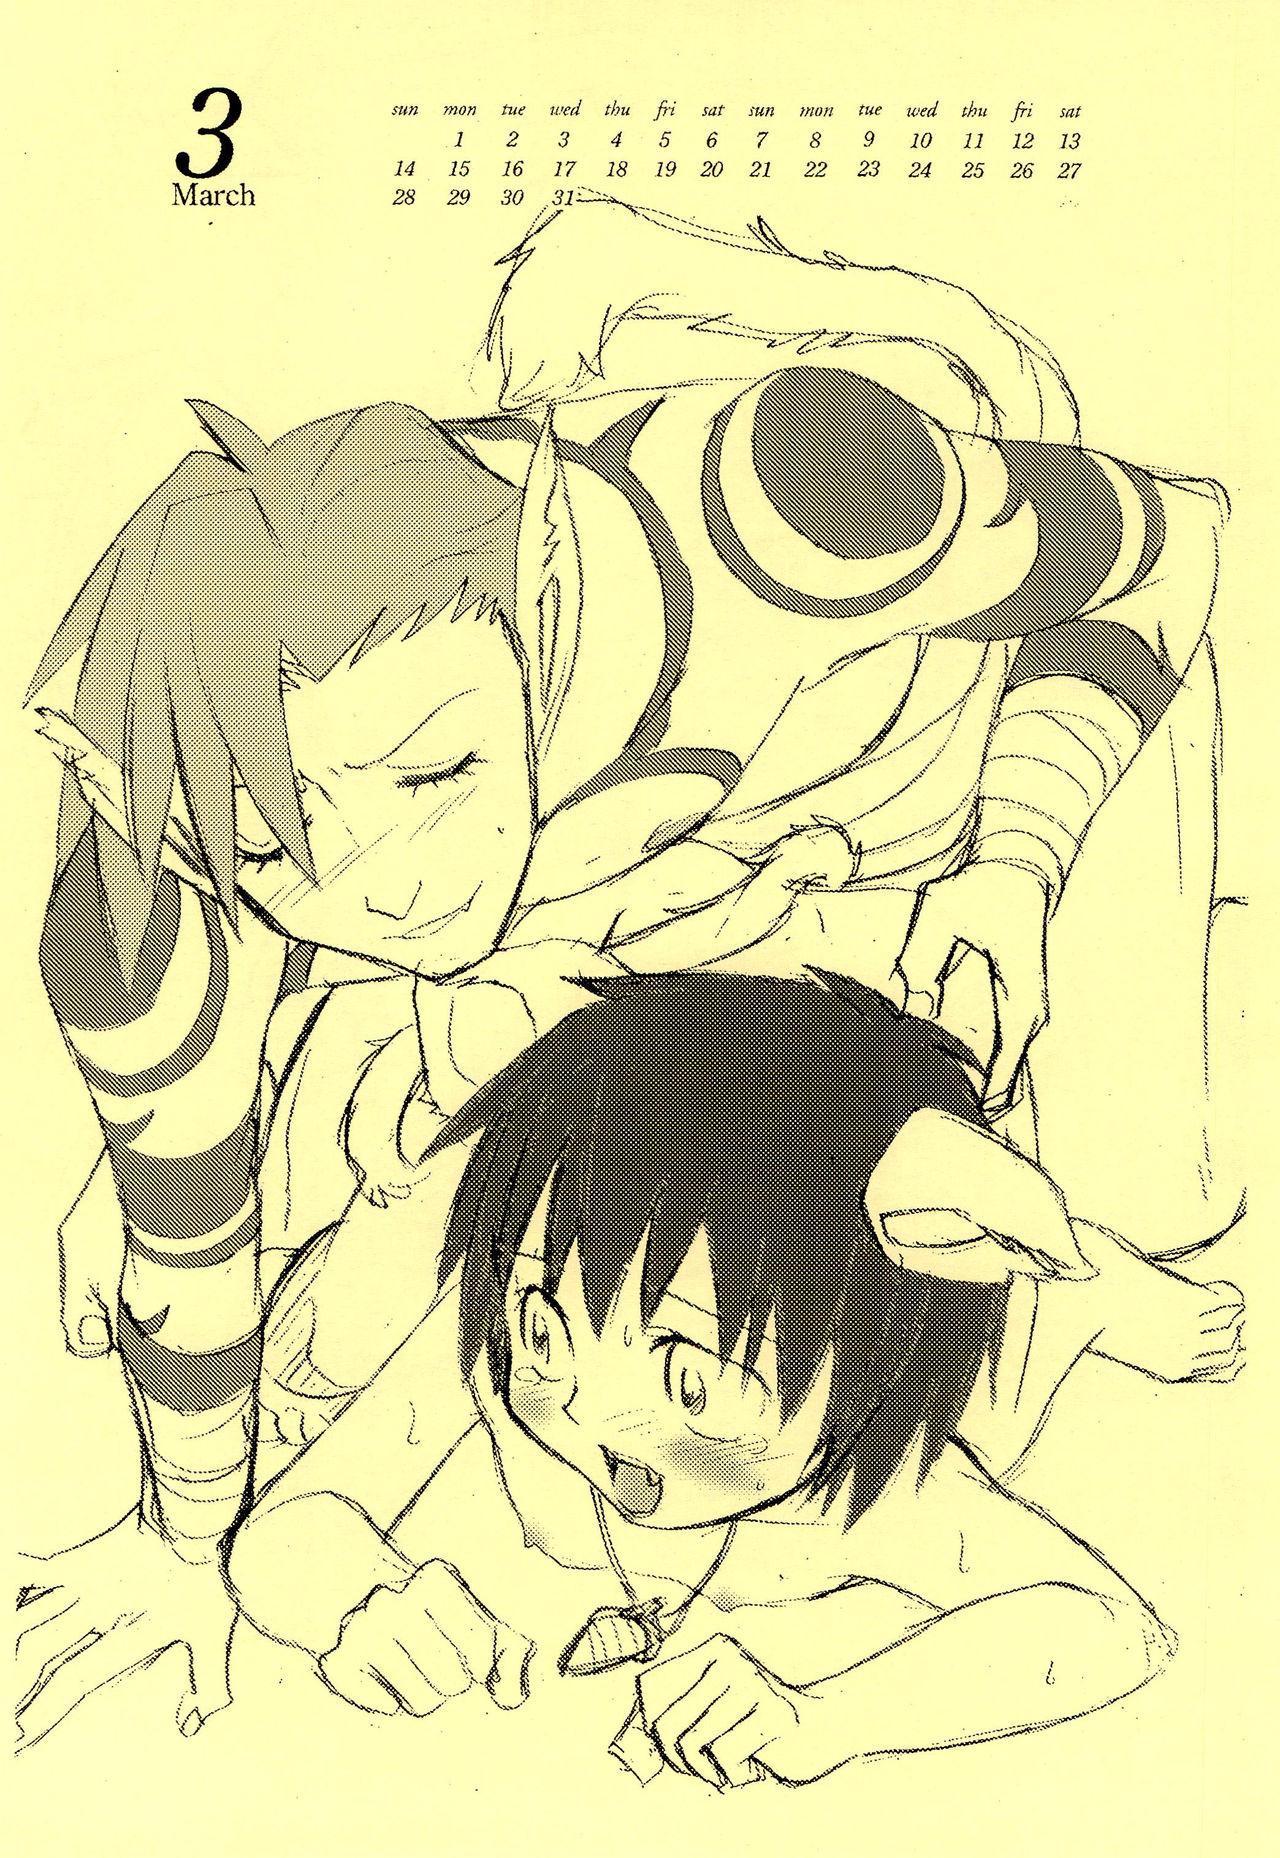 (C72) [Shamon Tei (Shamon)] KamiShimo to Ichinenjuu 2007-nen 9-gatsu - 2008-nen 8-gatsu Calendar (Gurren Lagann) 7